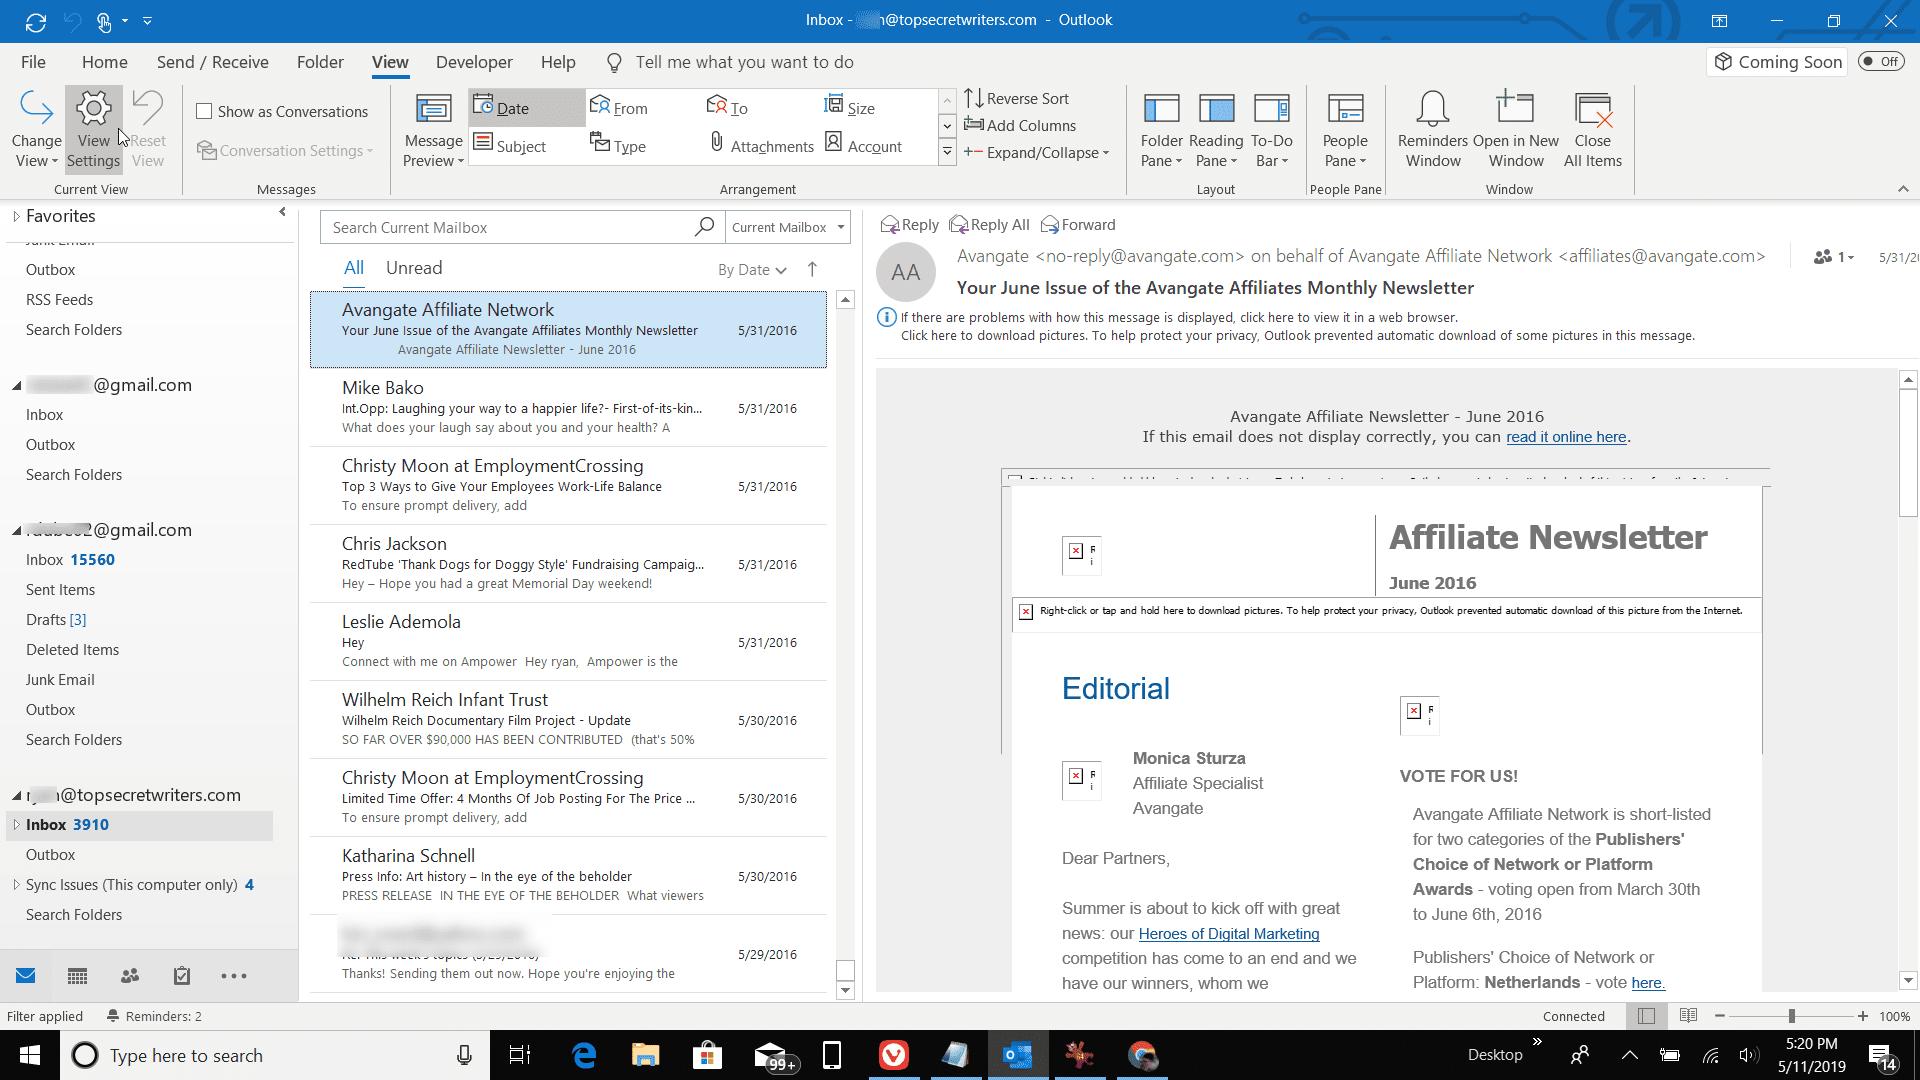 Screenshot of View Settings in Outlook